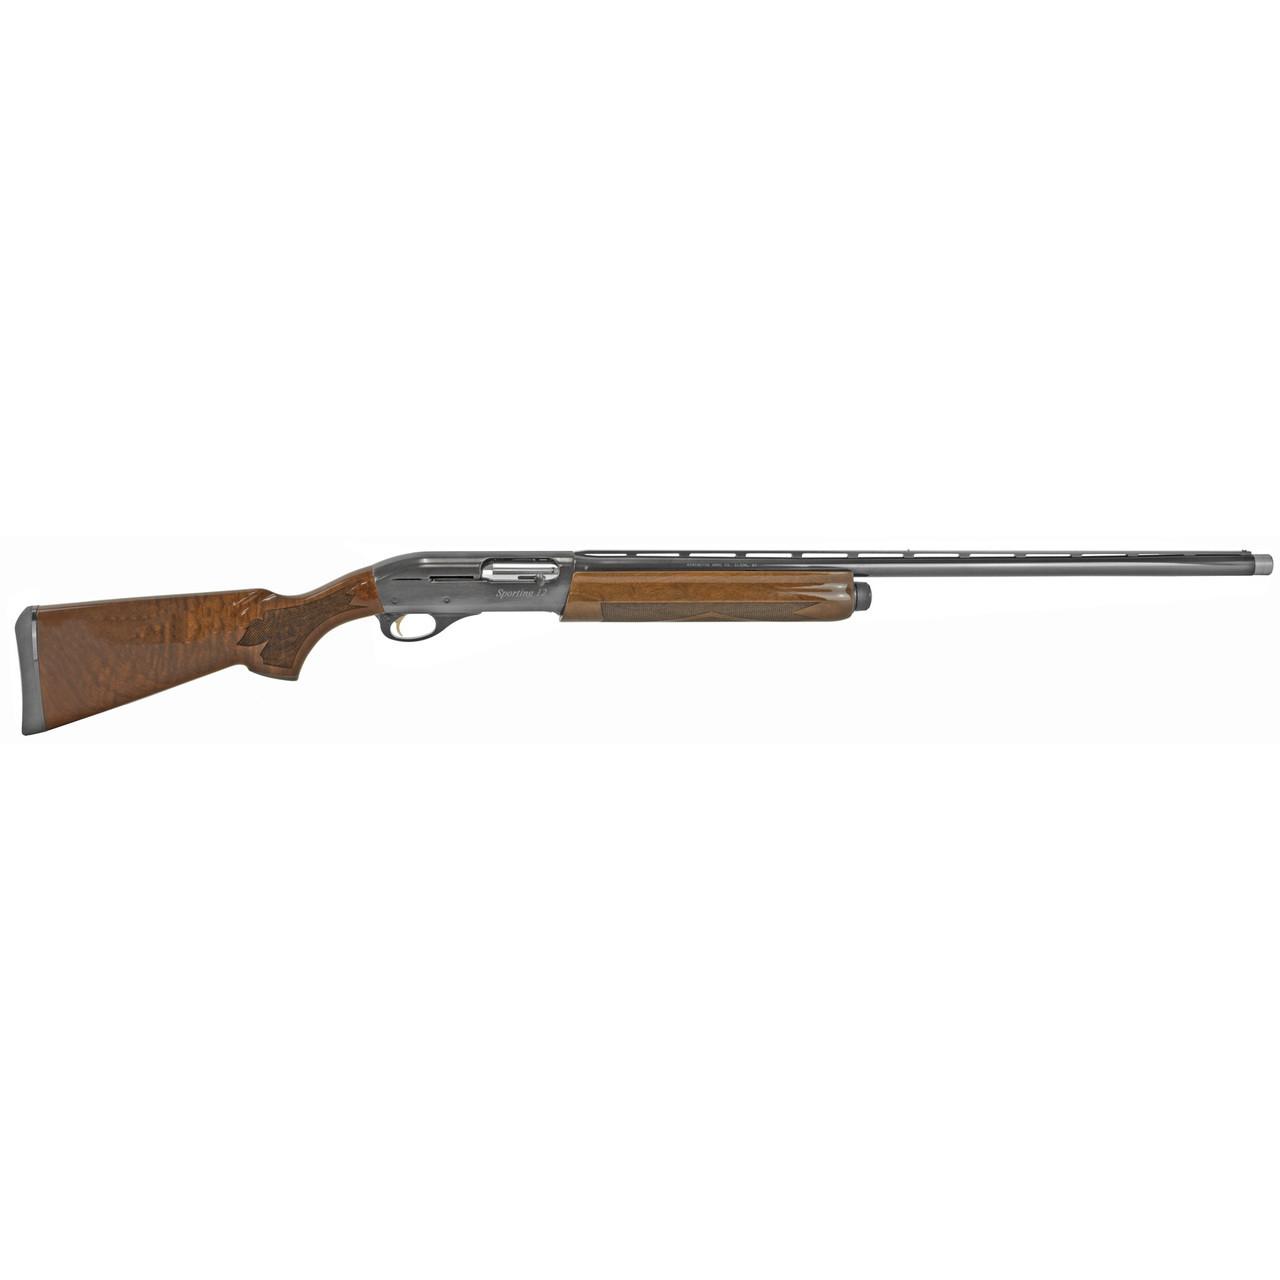 Remington 1100 SPTG CALIFORNIA LEGAL - 12ga - Walnut High Gloss